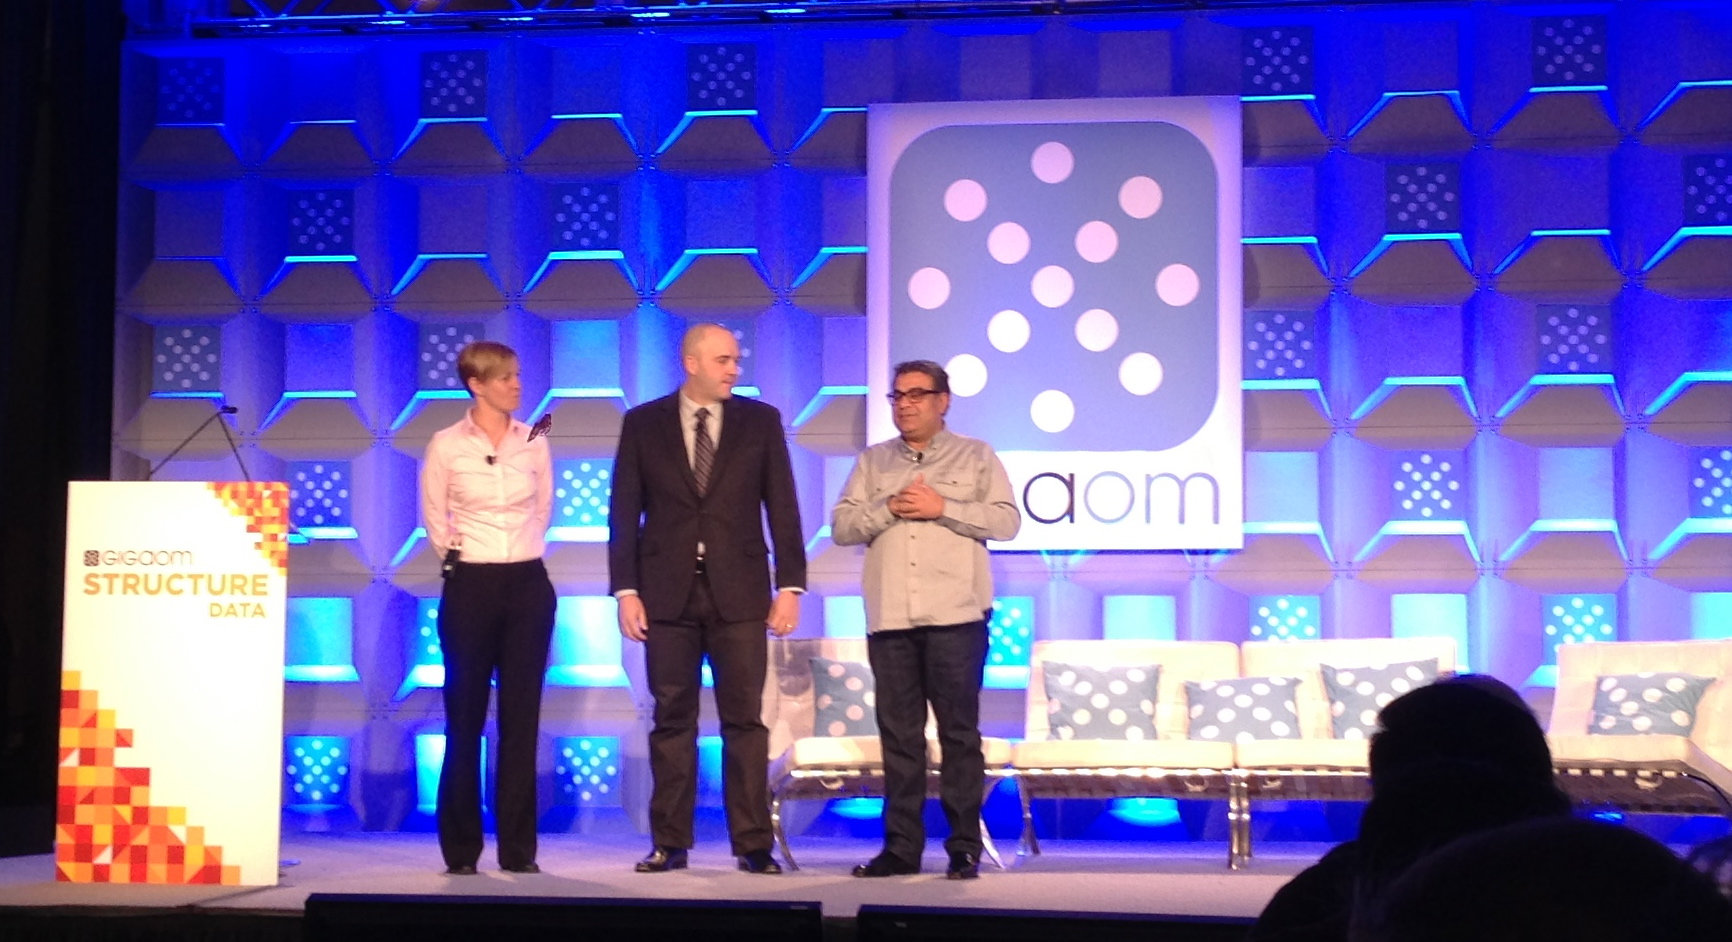 GigaOmStructureDataNYC2013Start